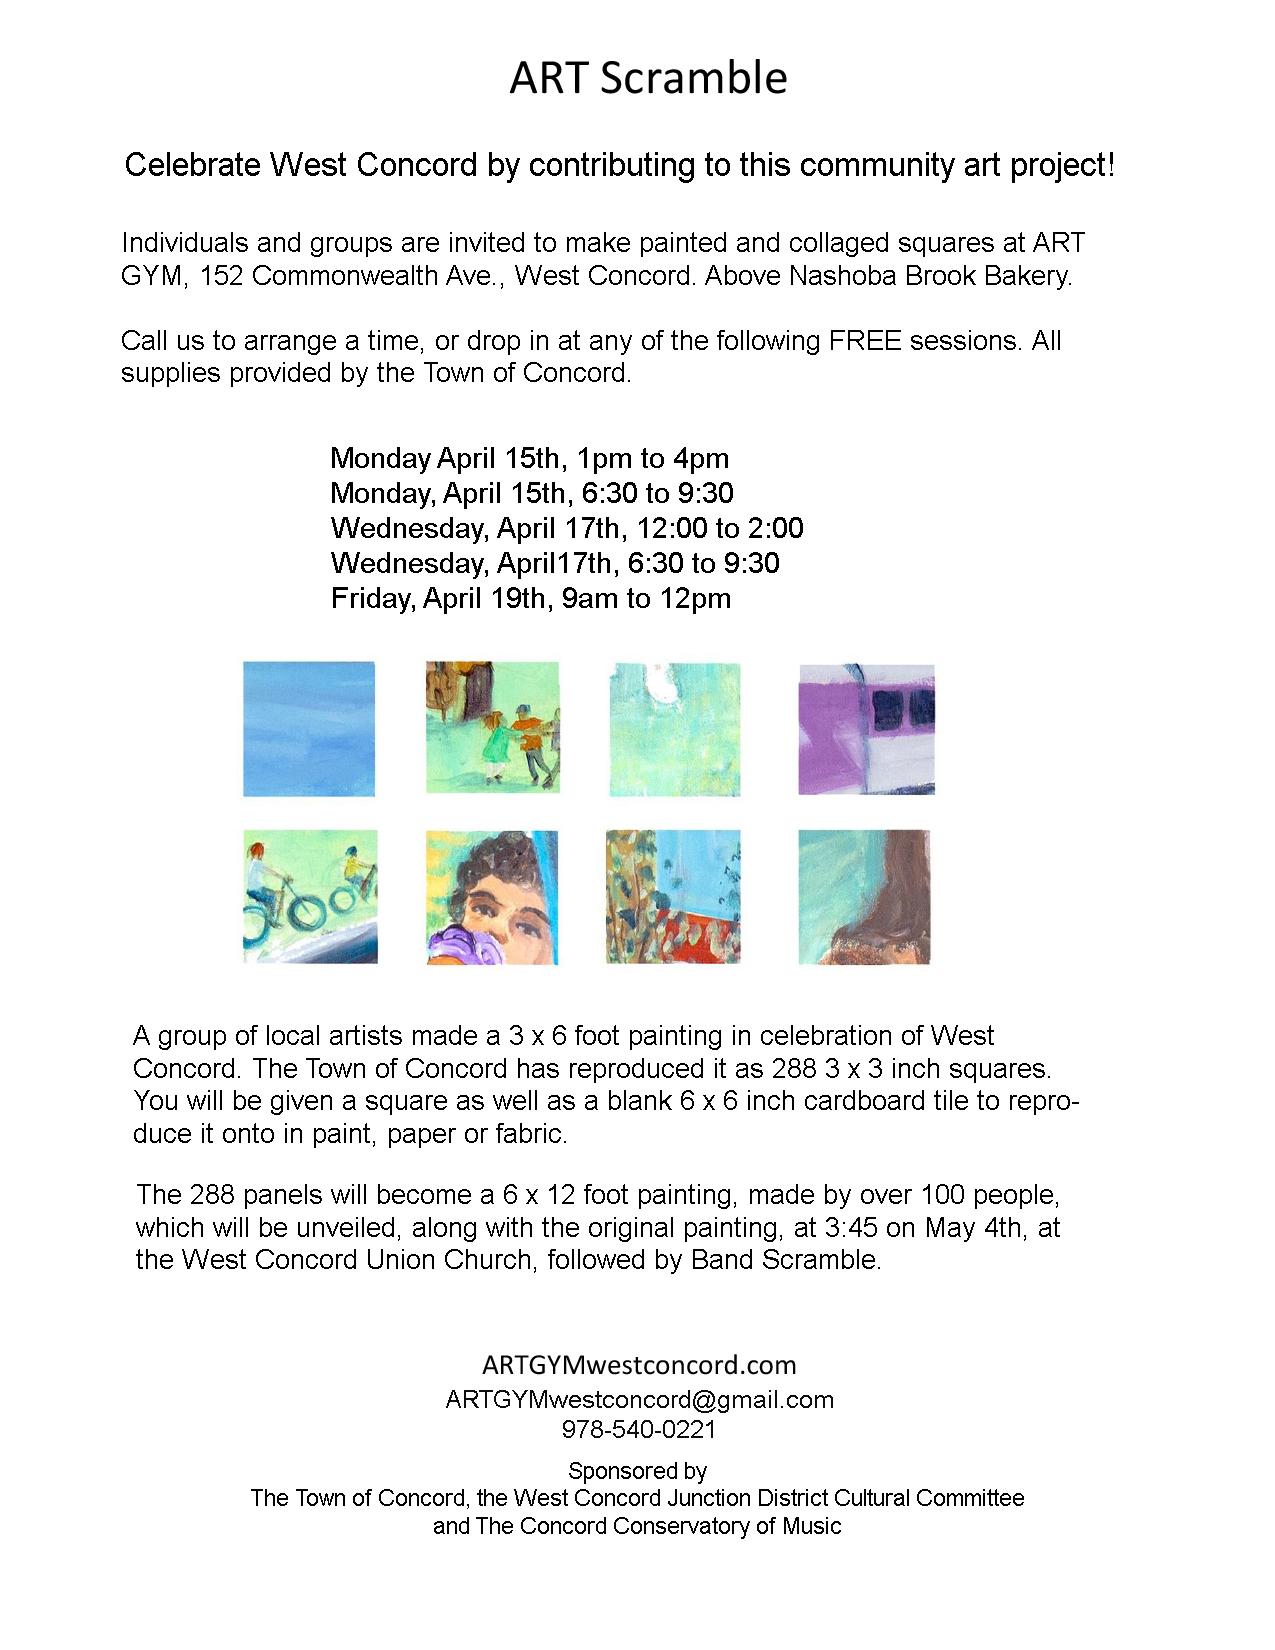 ART Scramble, invite revised.jpg